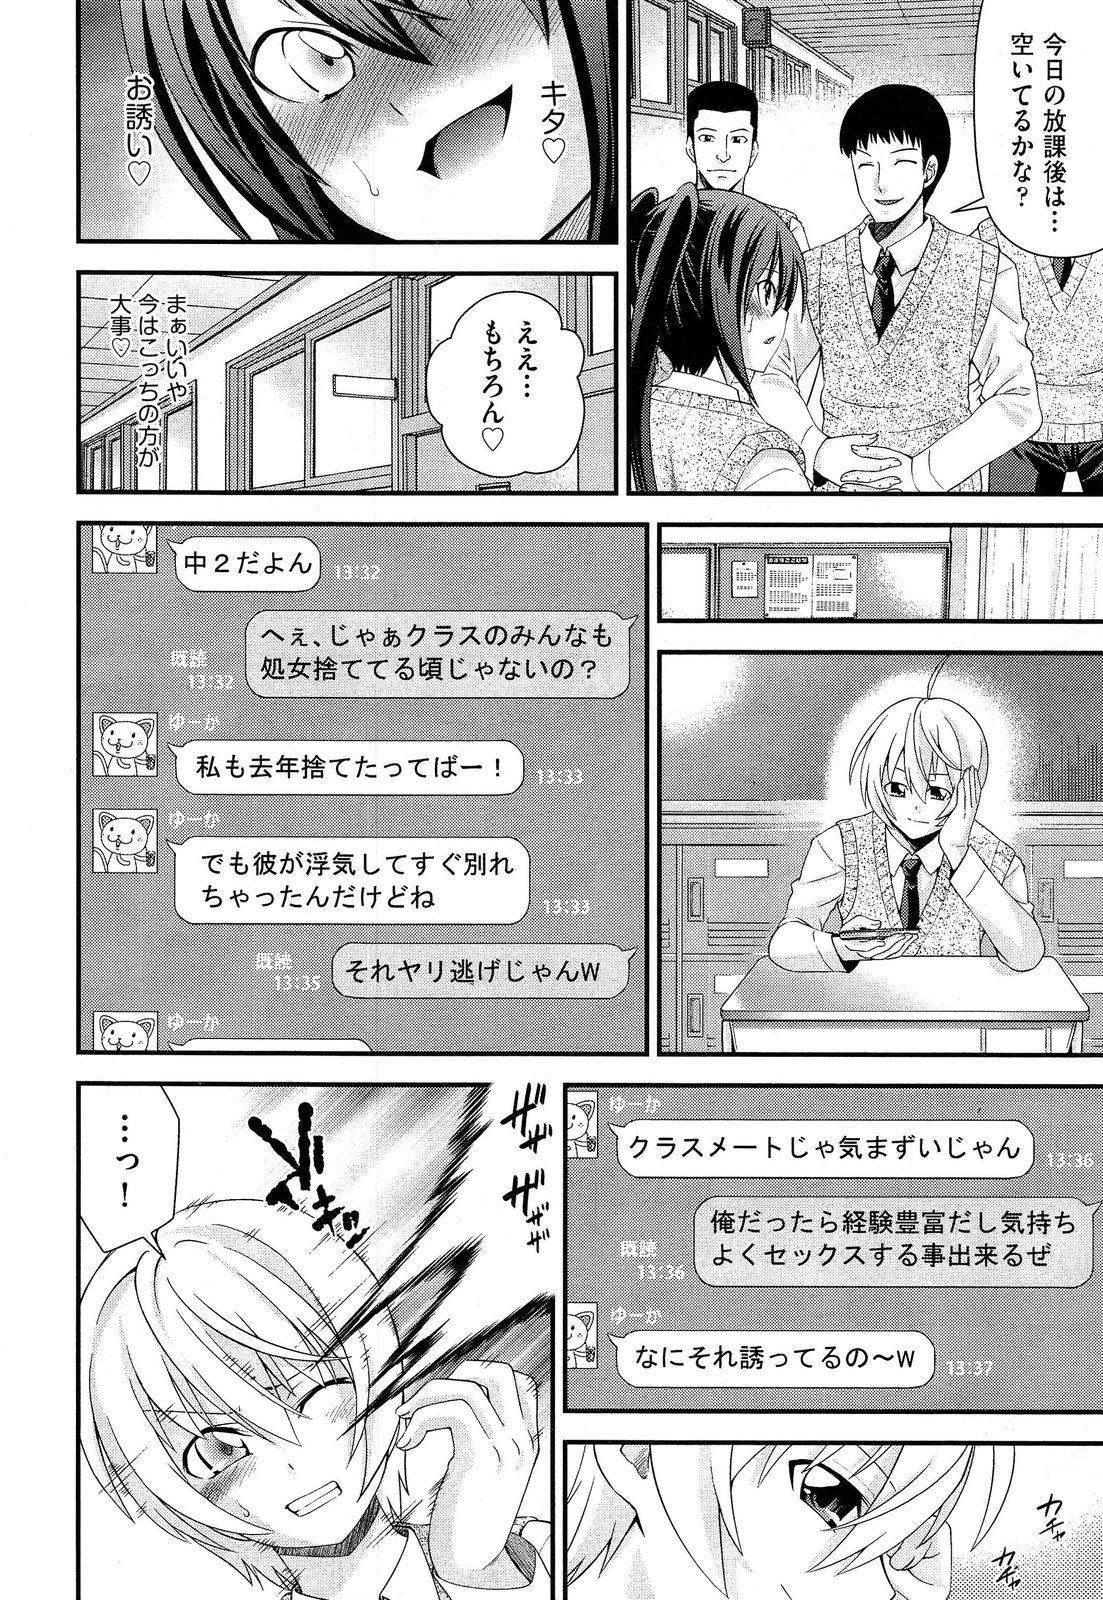 Kyoudai Replace 99